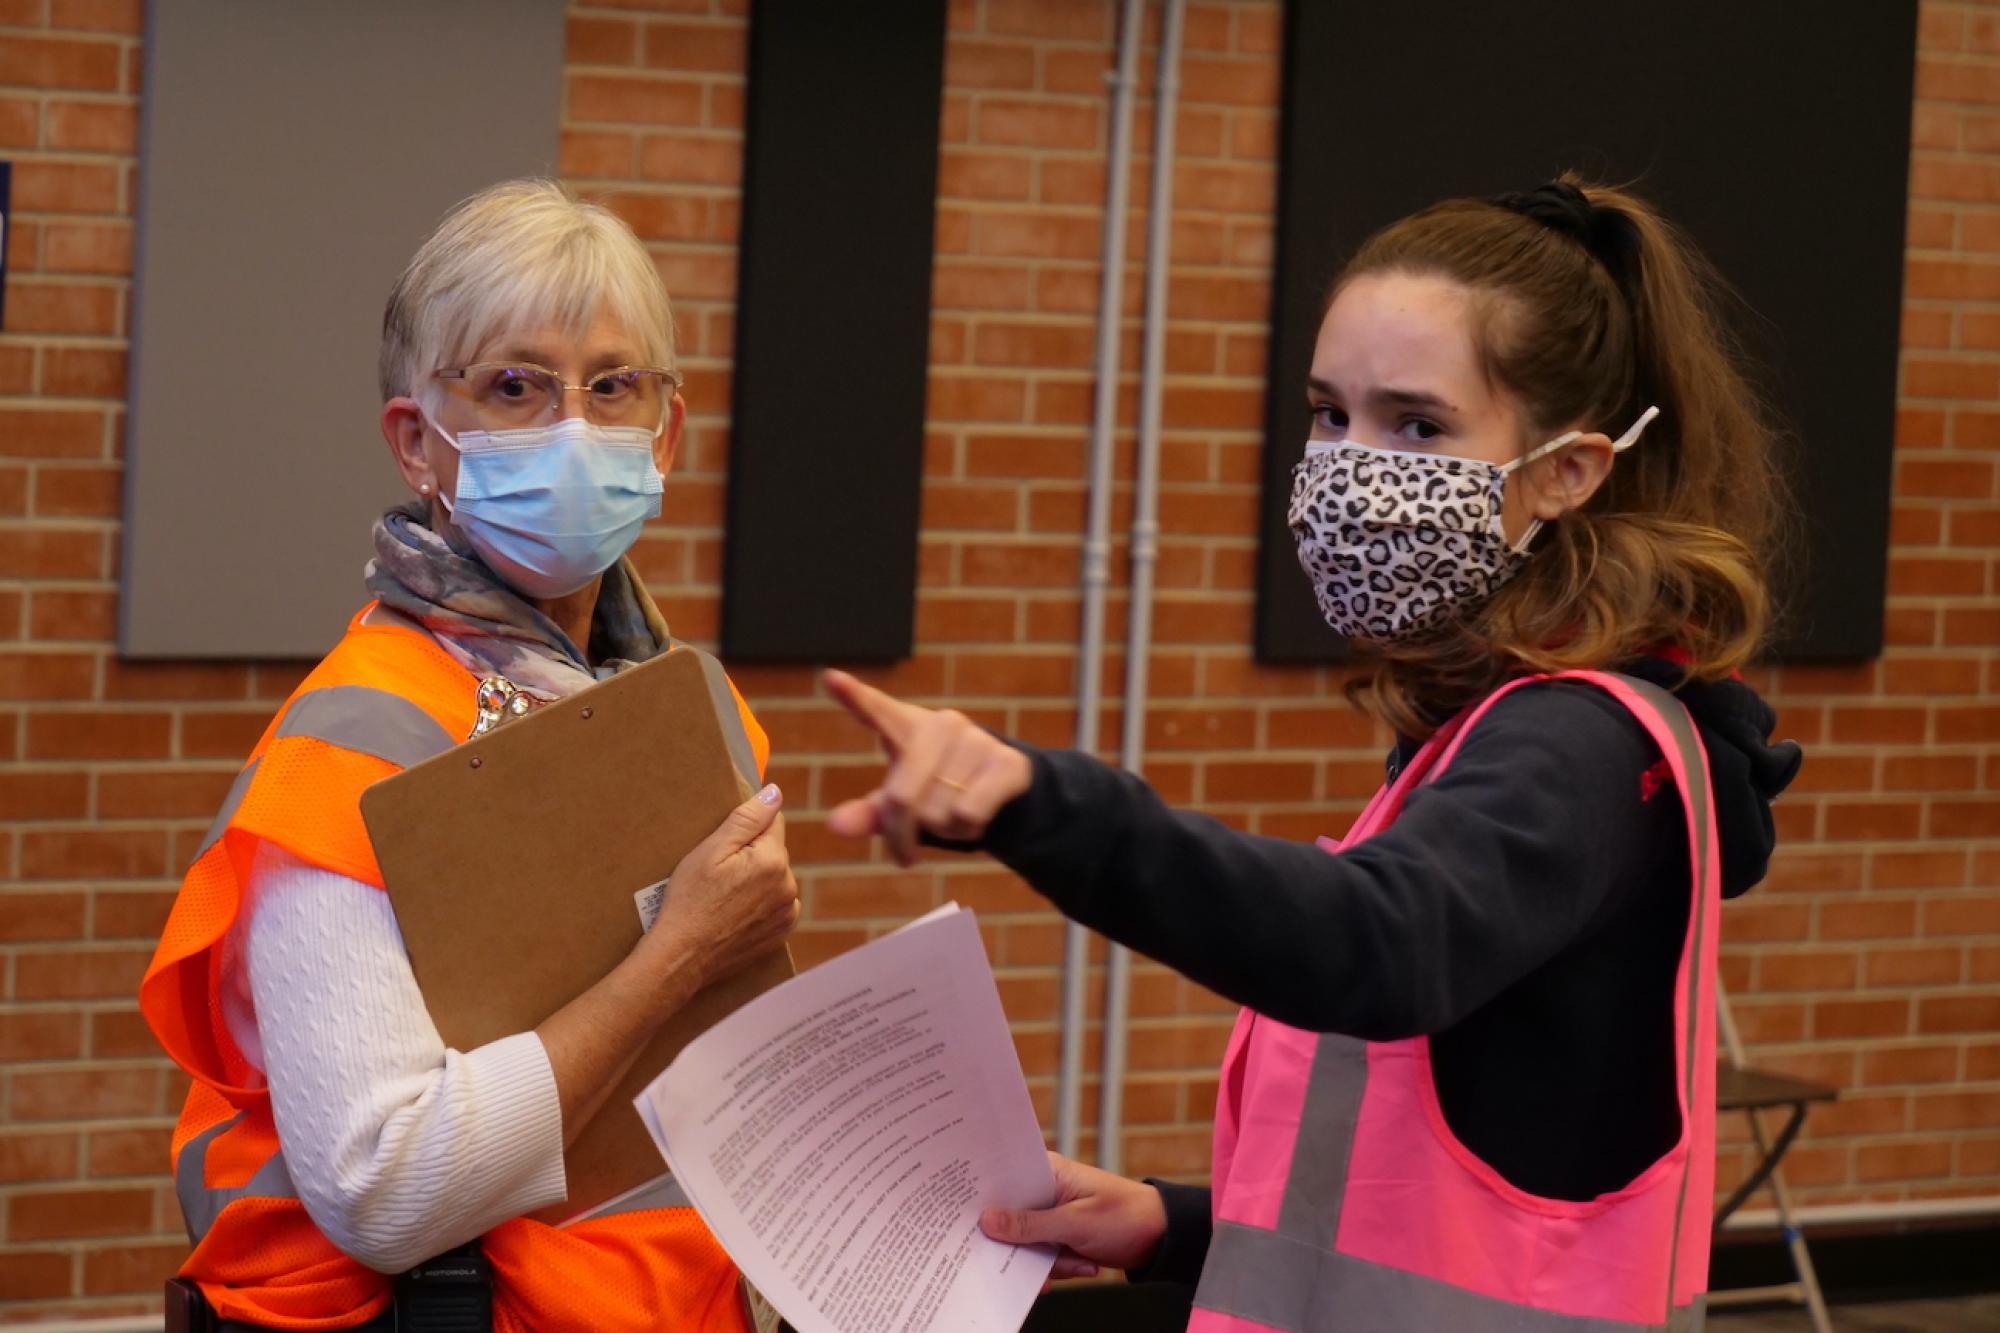 Sherry Daniels guides student volunteer